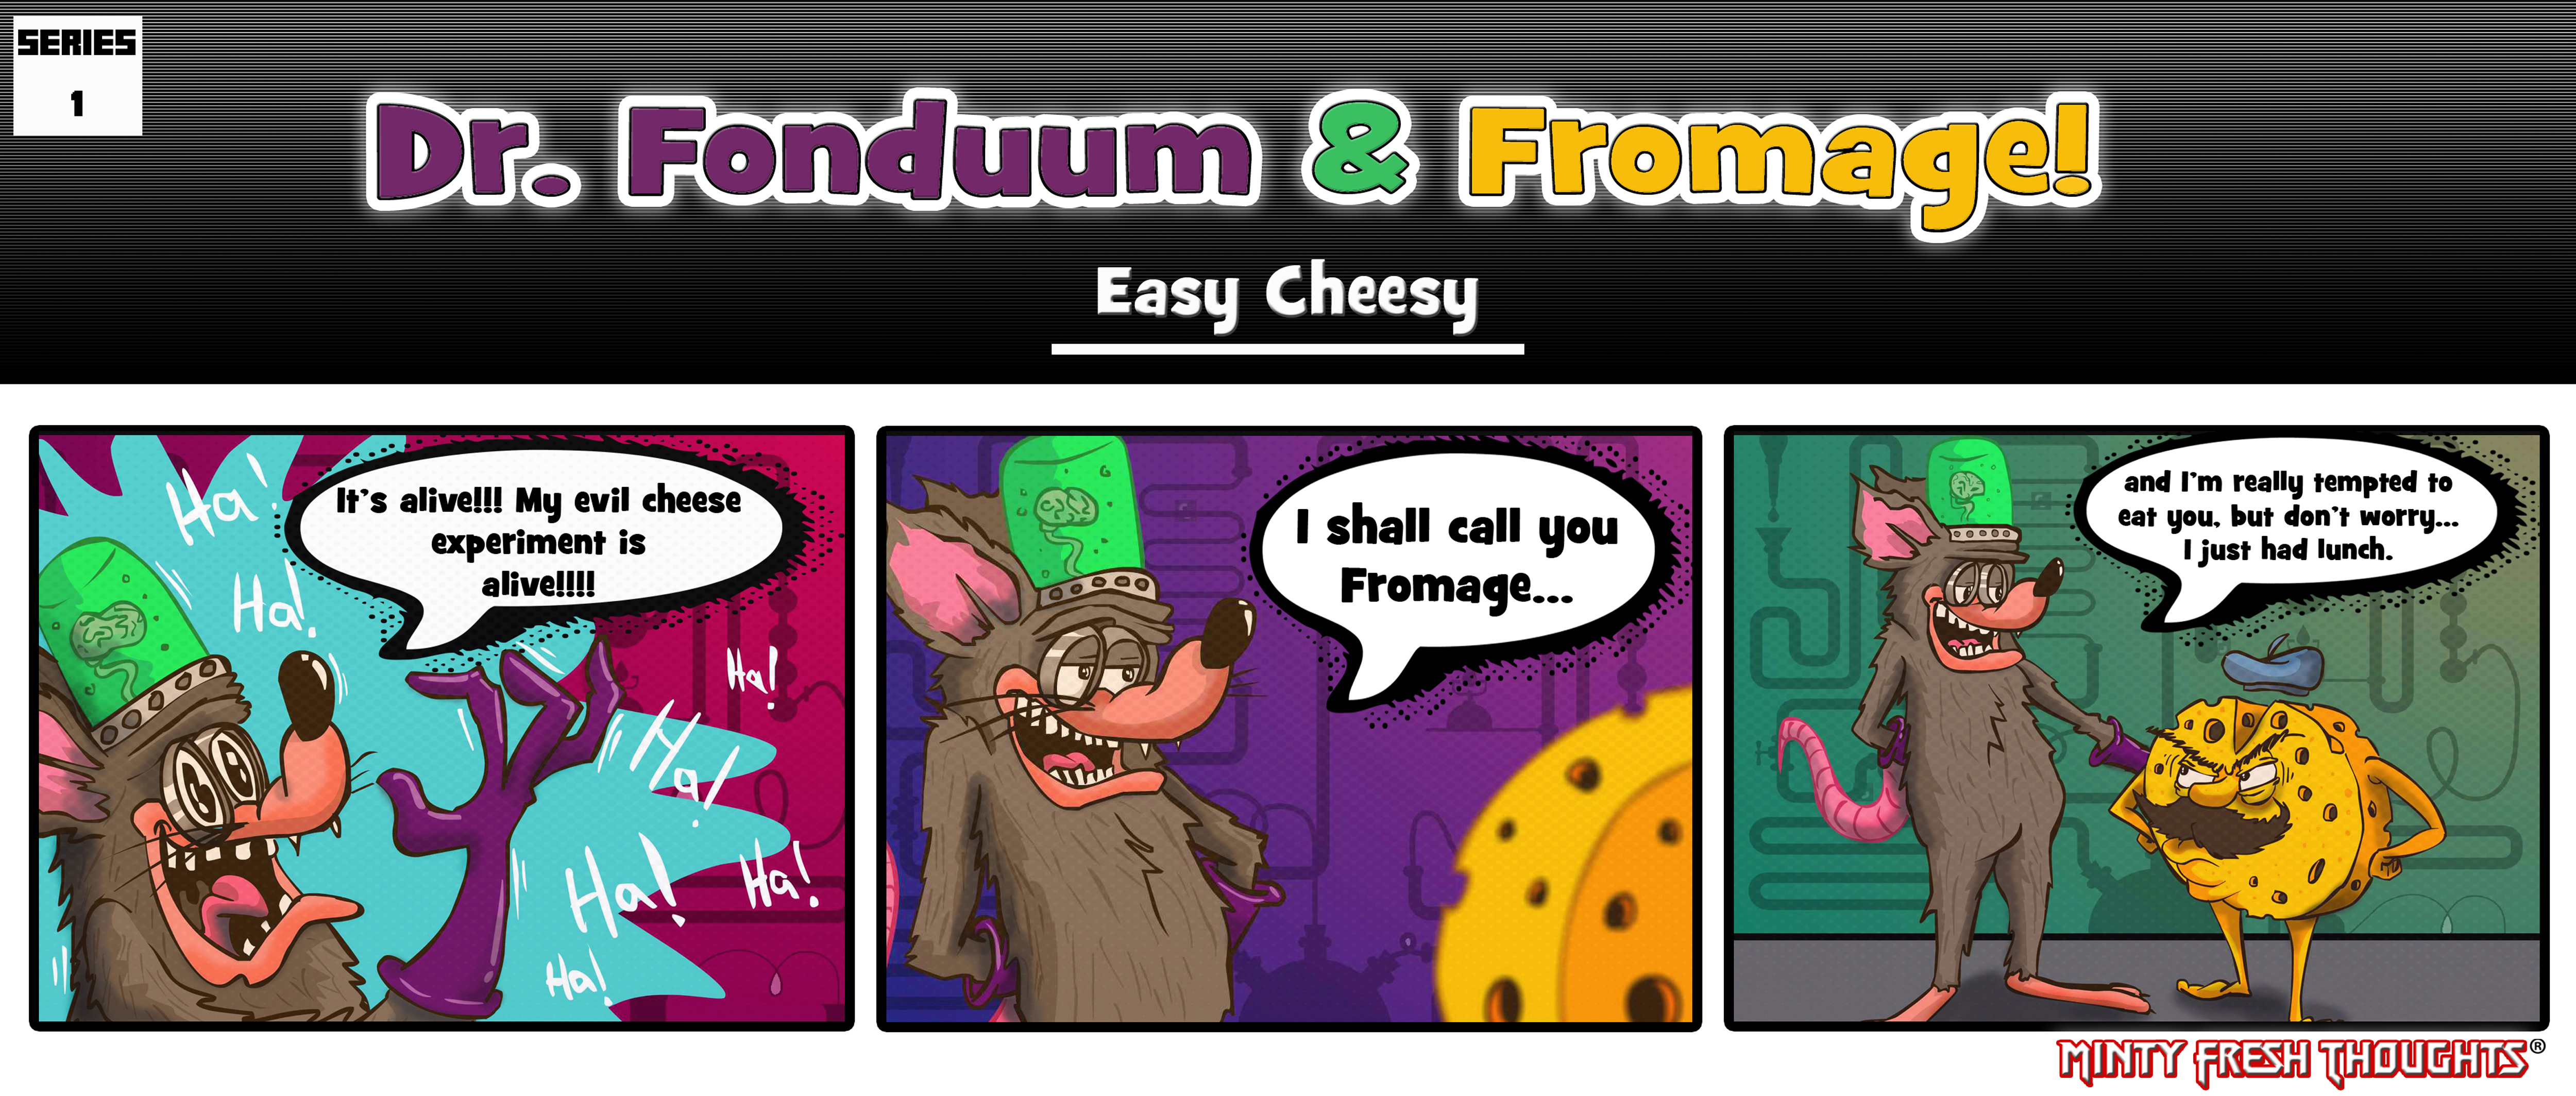 Dr. Fonduum & Fromage Volume 1 #01